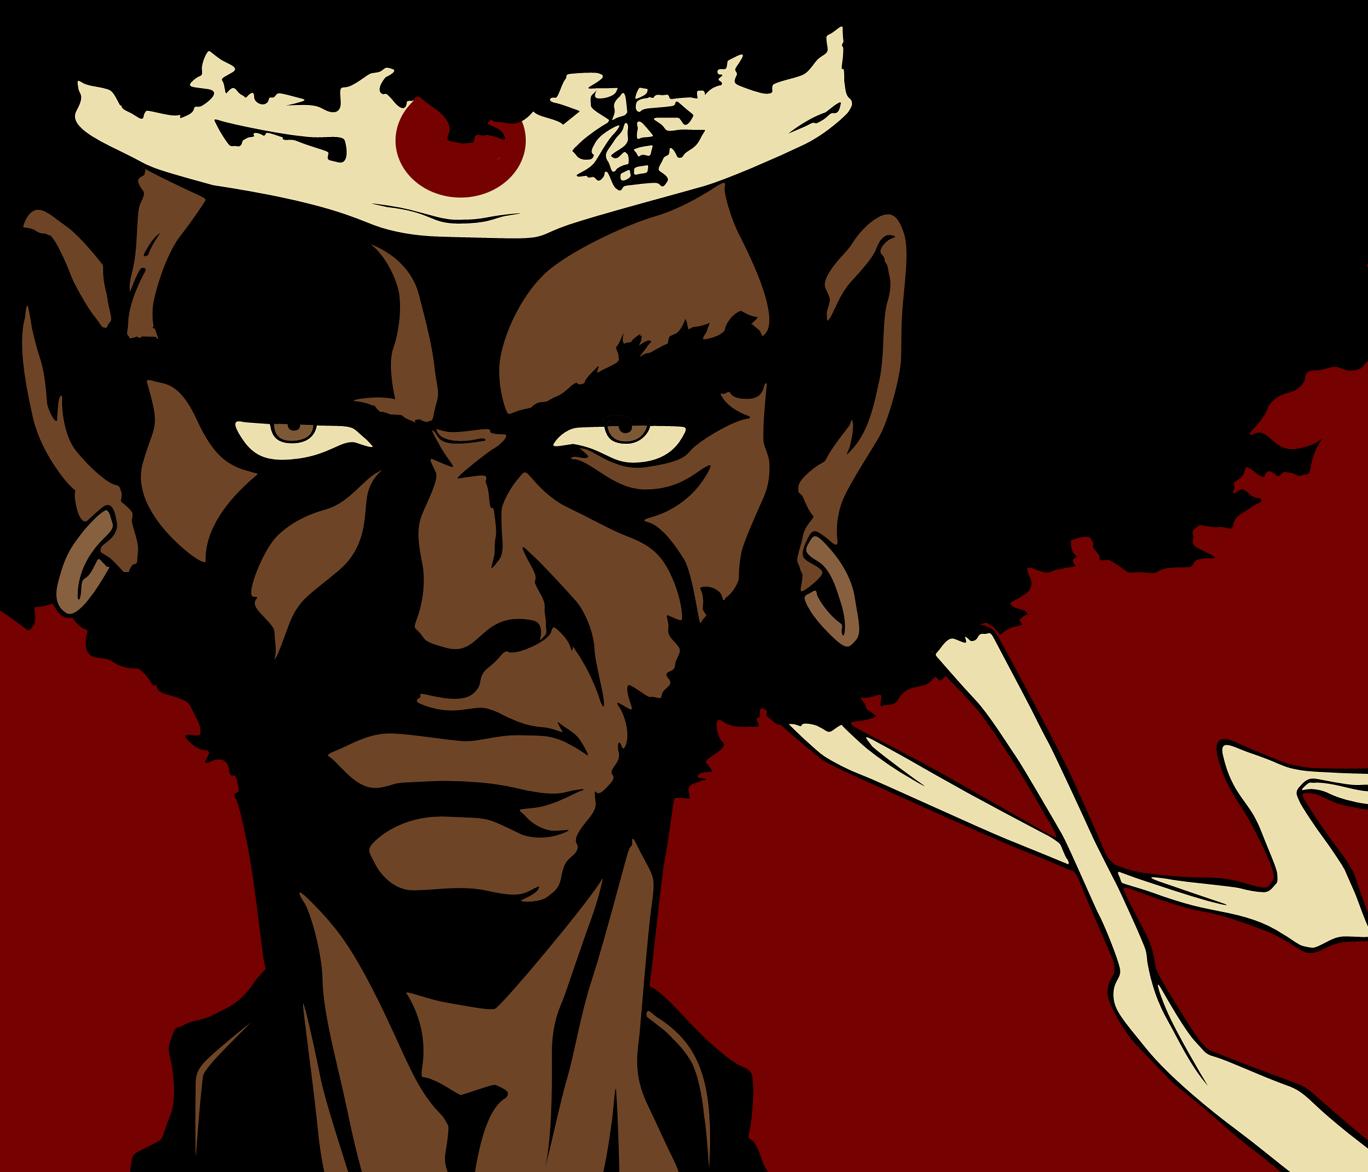 Furi [Afro Samurai]